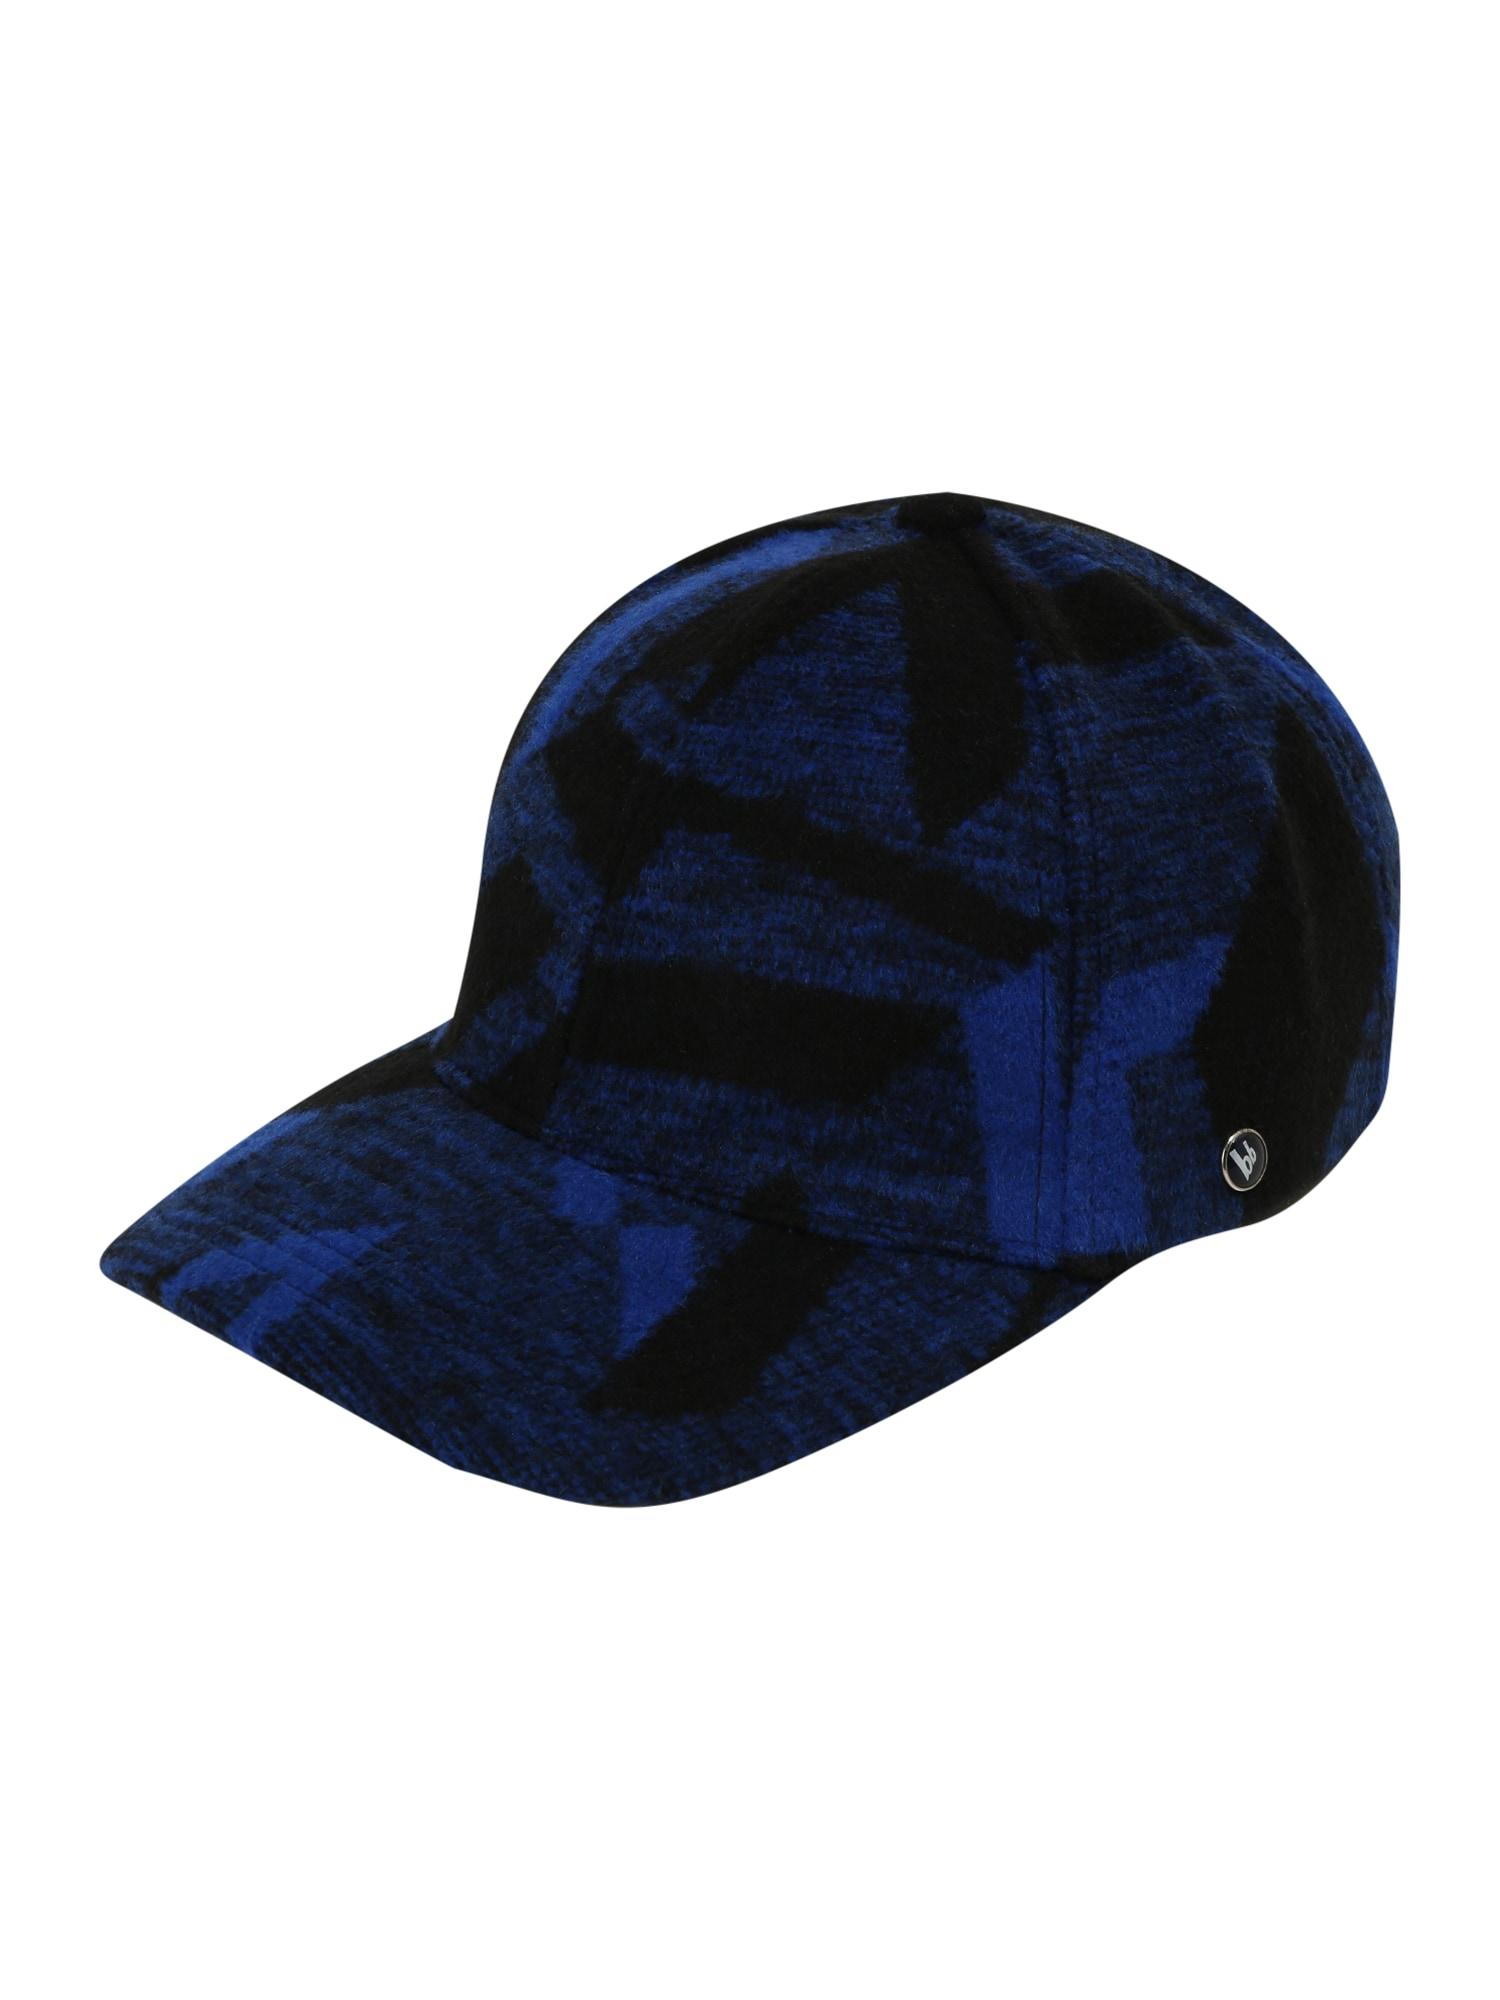 BRUNO BANANI Kepurė juoda / margai mėlyna / tamsiai mėlyna